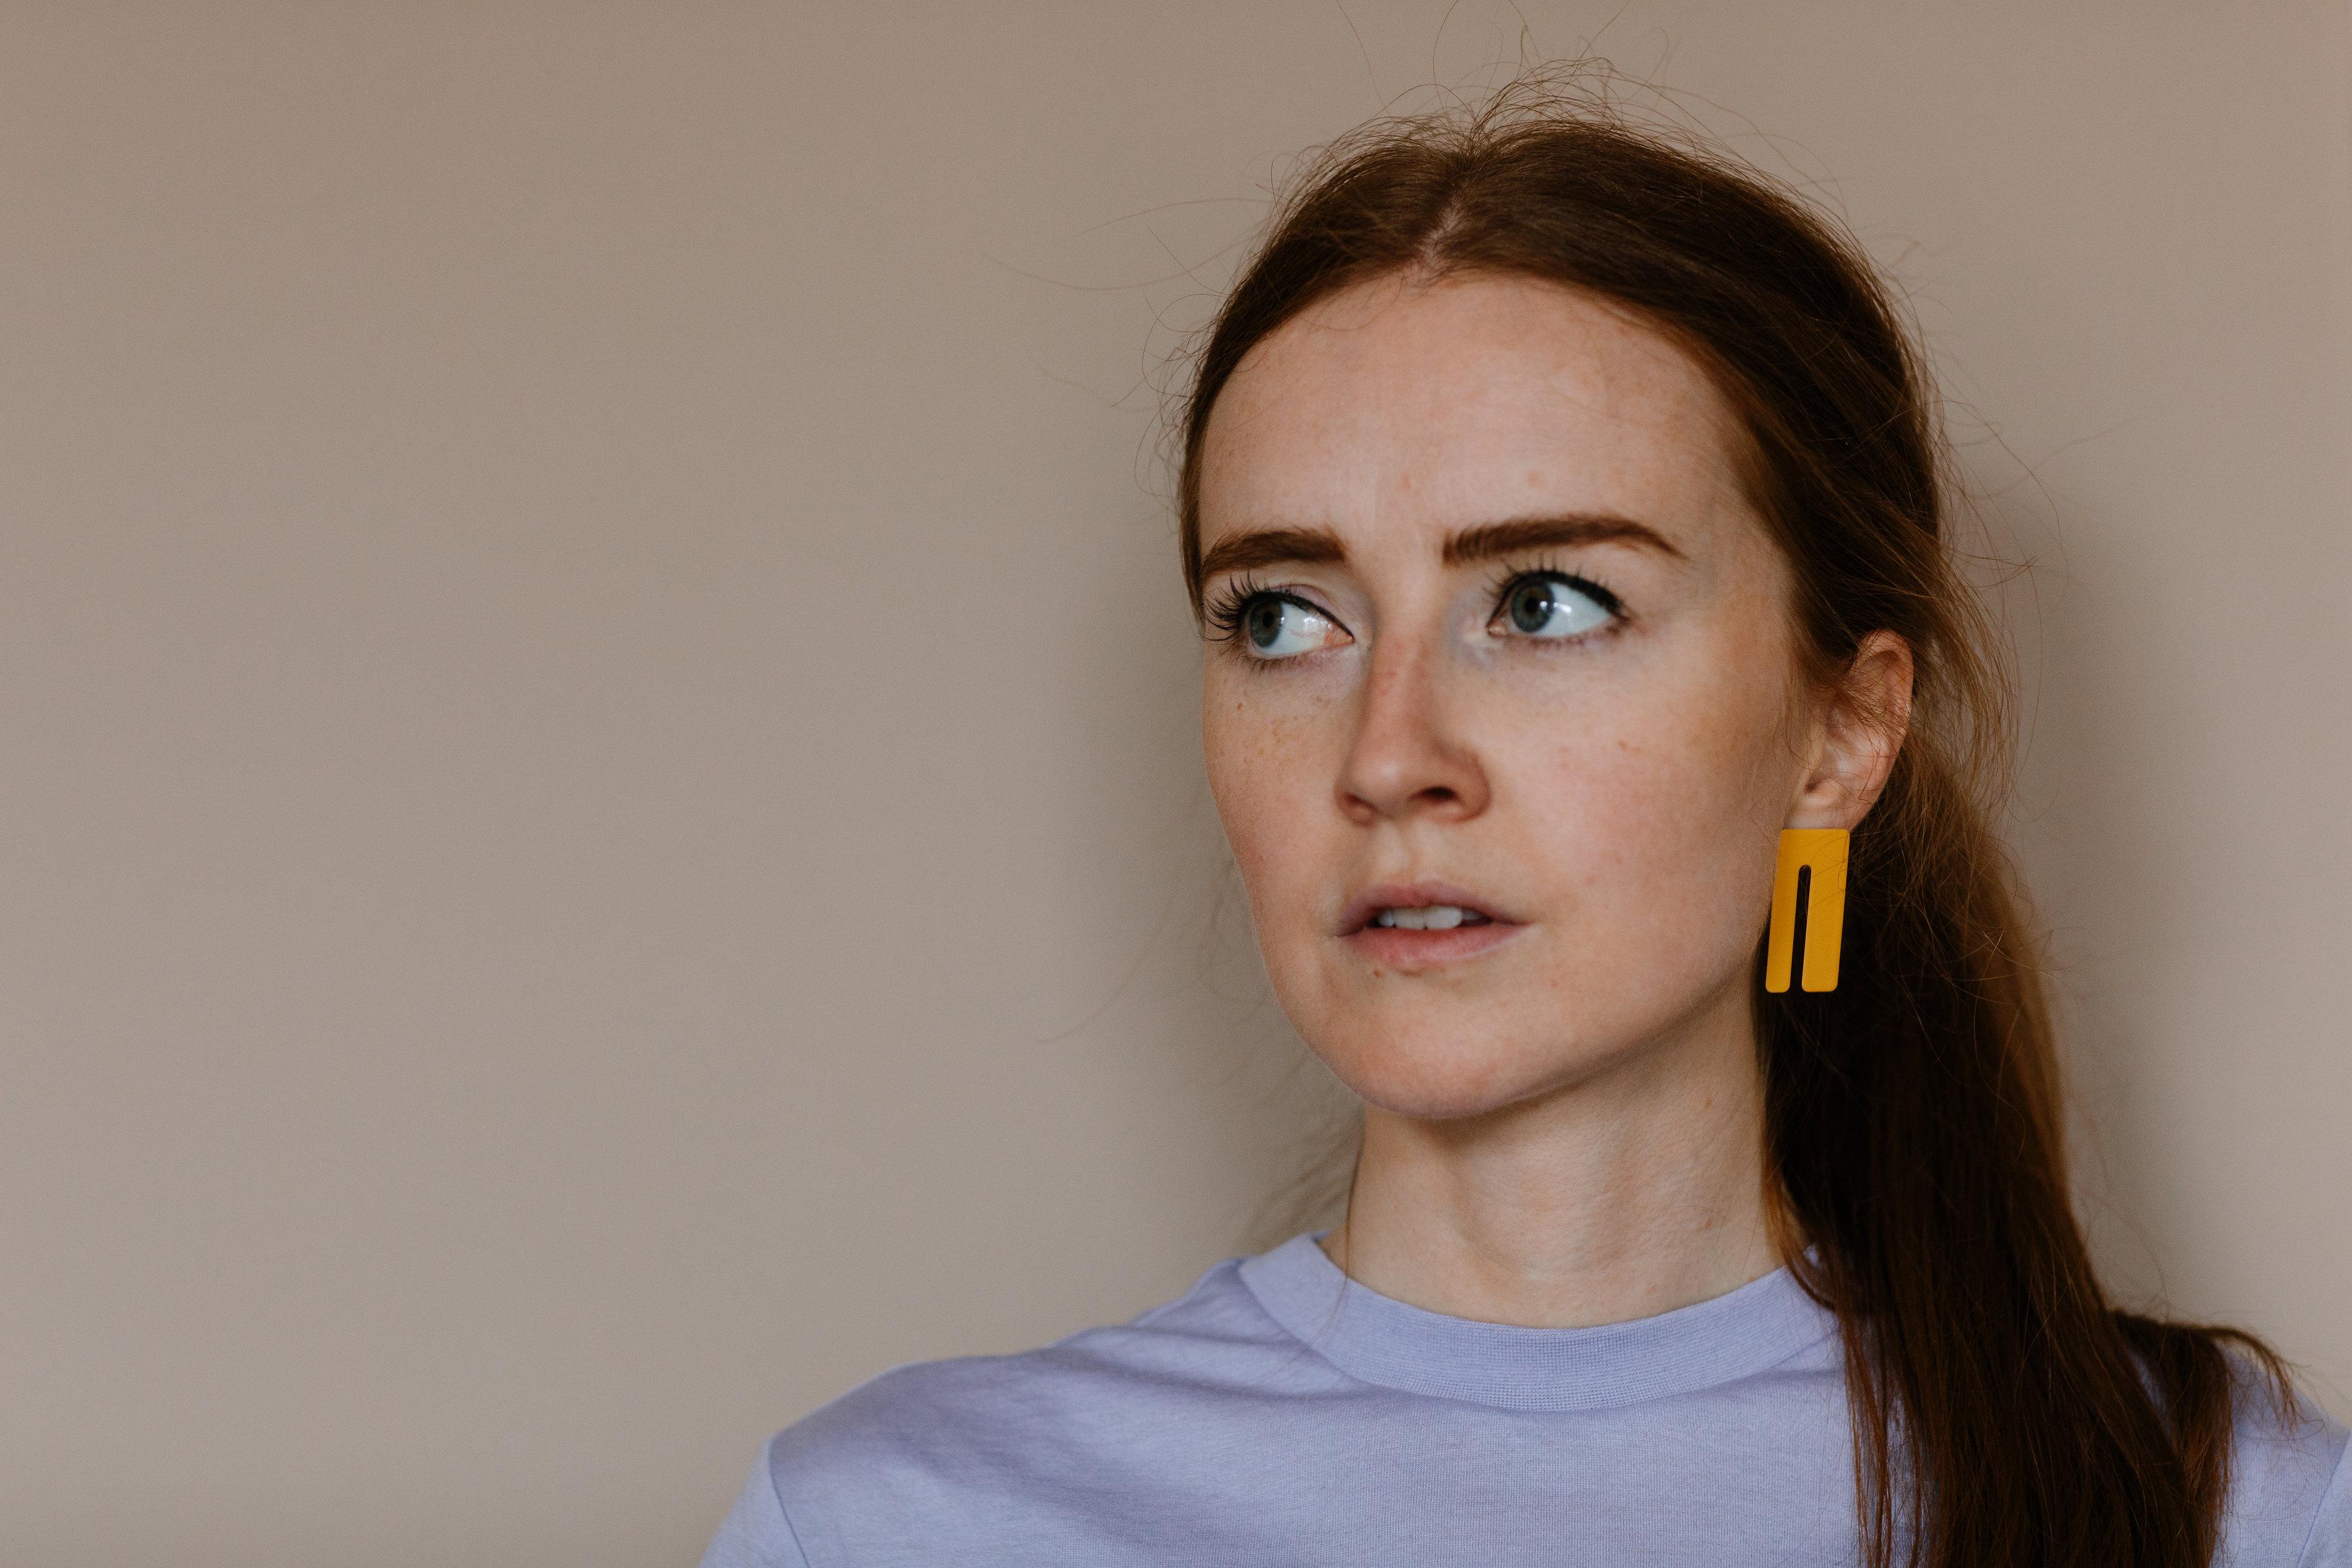 Slot Earrings (photo: Caro Weiss)